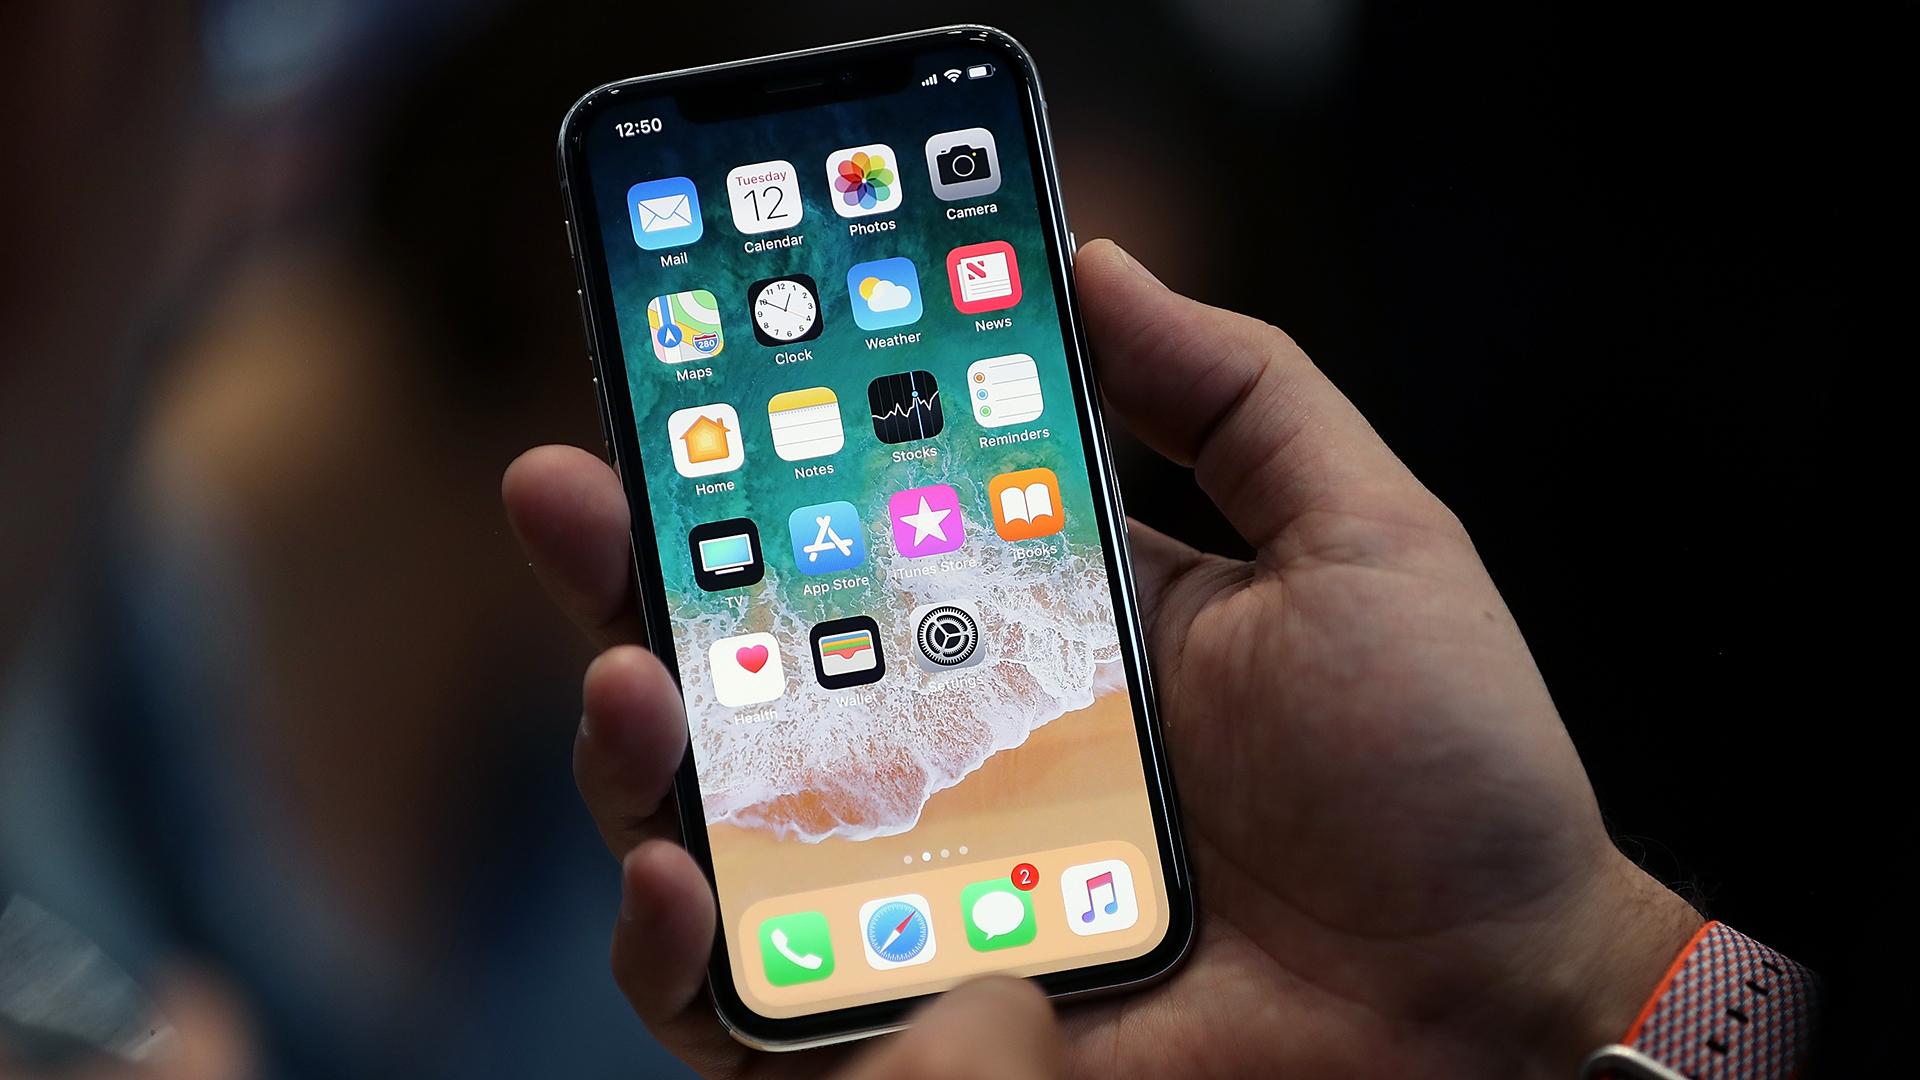 Apple iPhone X displayed-159532.jpg20323405